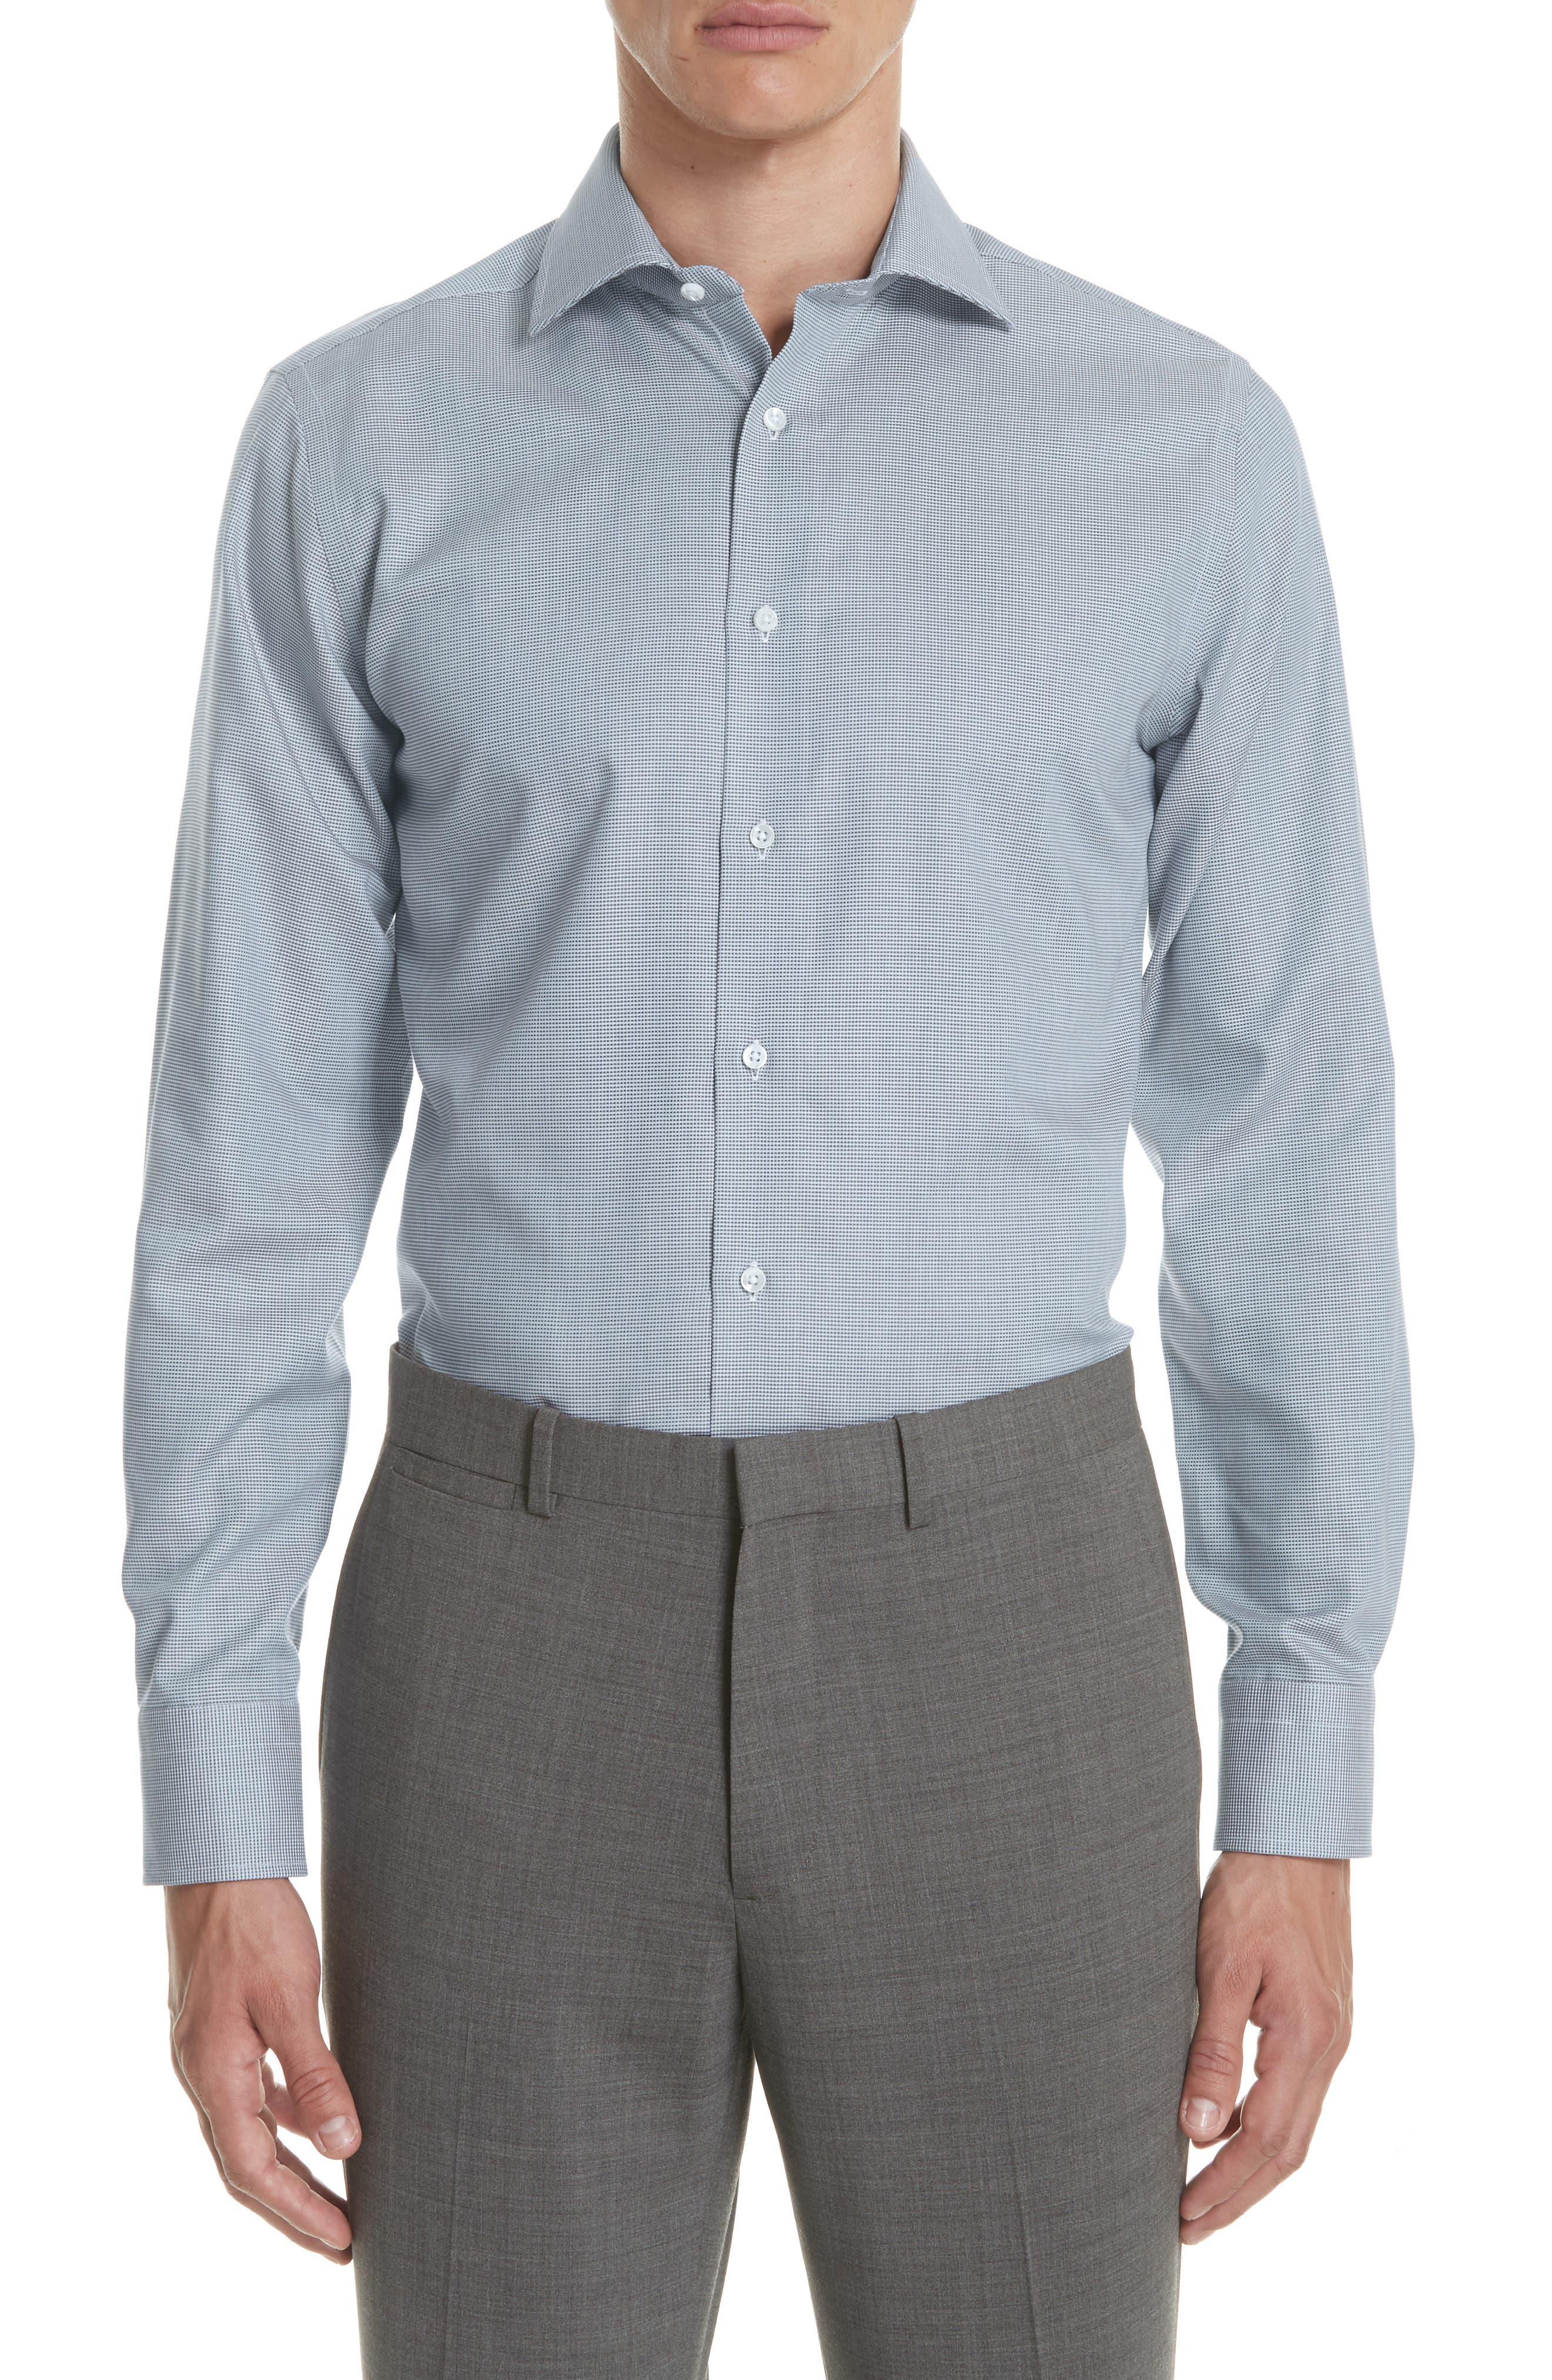 Regular Fit Solid Dress Shirt,                         Main,                         color, 200